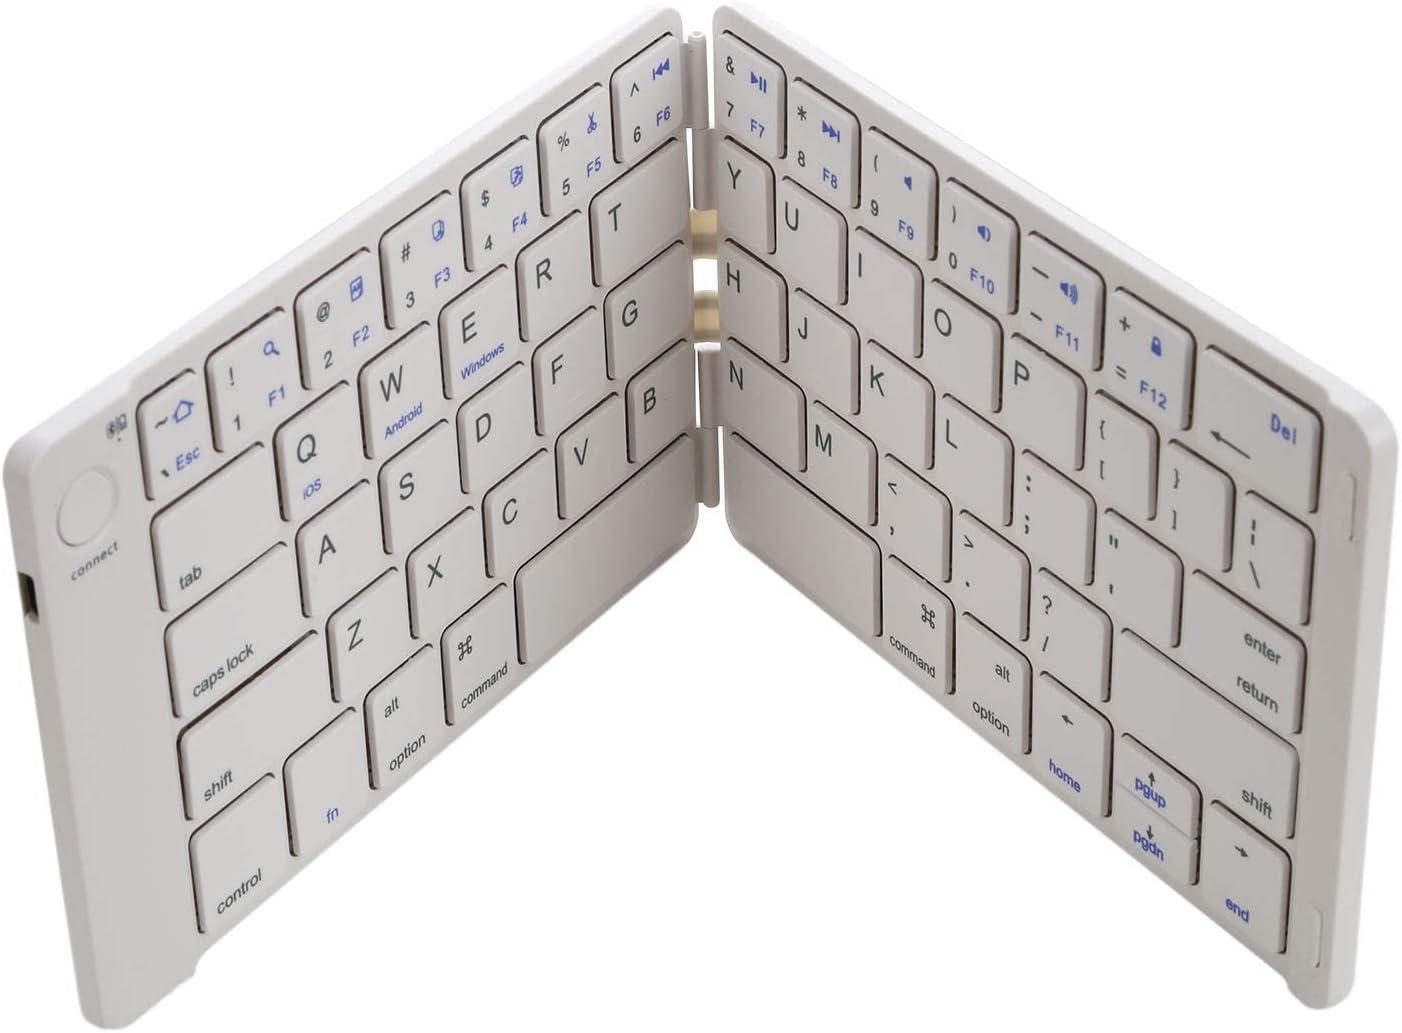 Value-5-Star White Foldable Bluetooth Keyboard Ultrathin Rechargeable Folding Bluetooth Wireless Keyboard